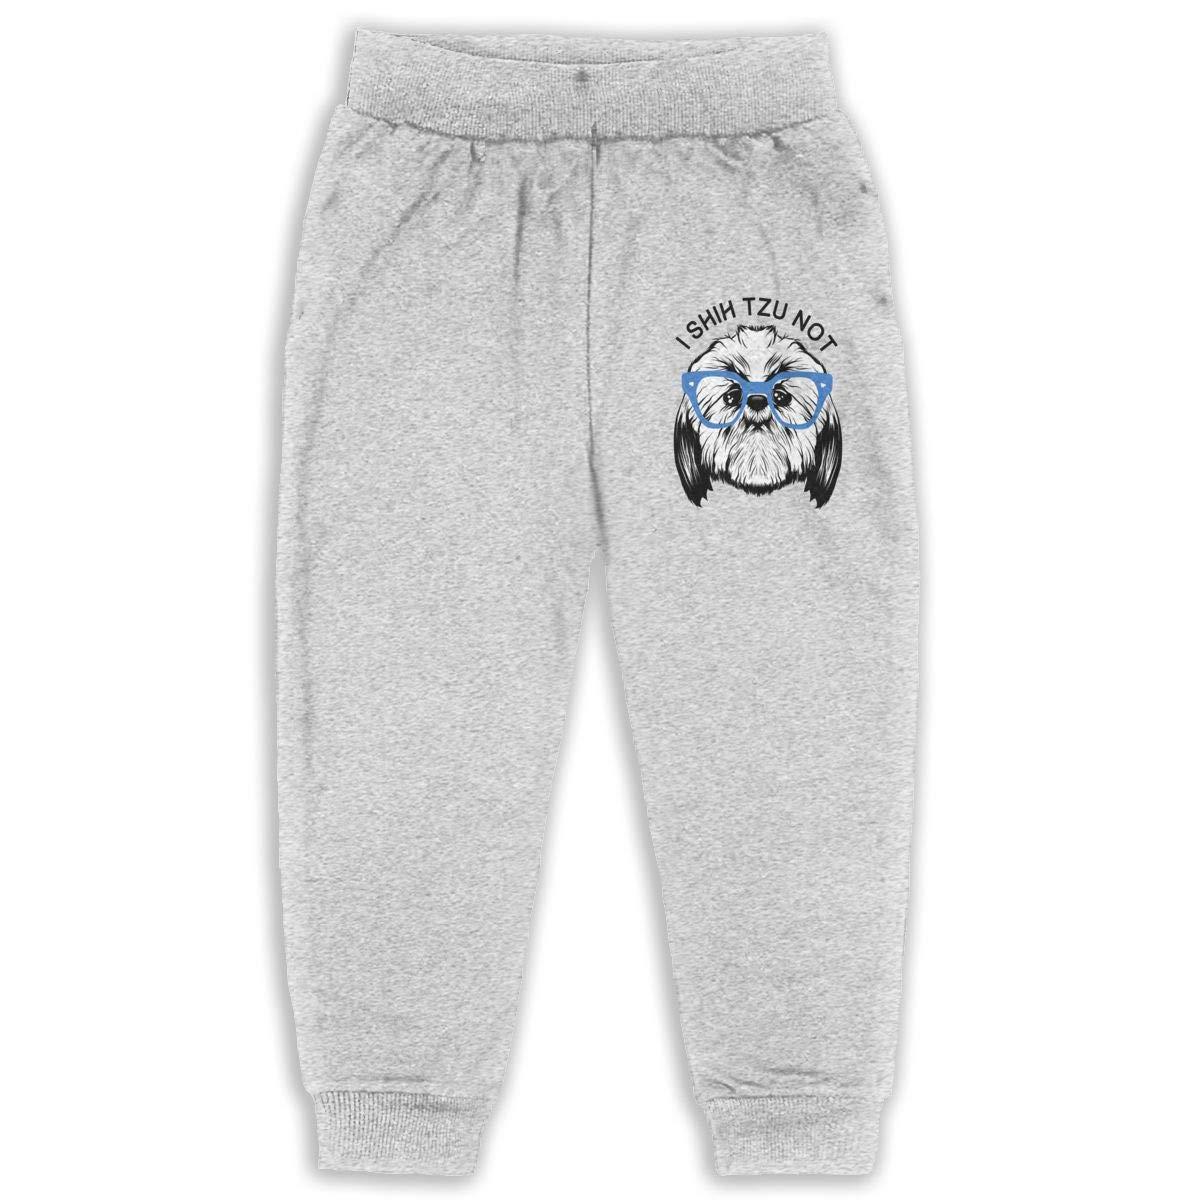 I Shih Tzu Not Kids Cotton Sweatpants,Jogger Long Jersey Sweatpants